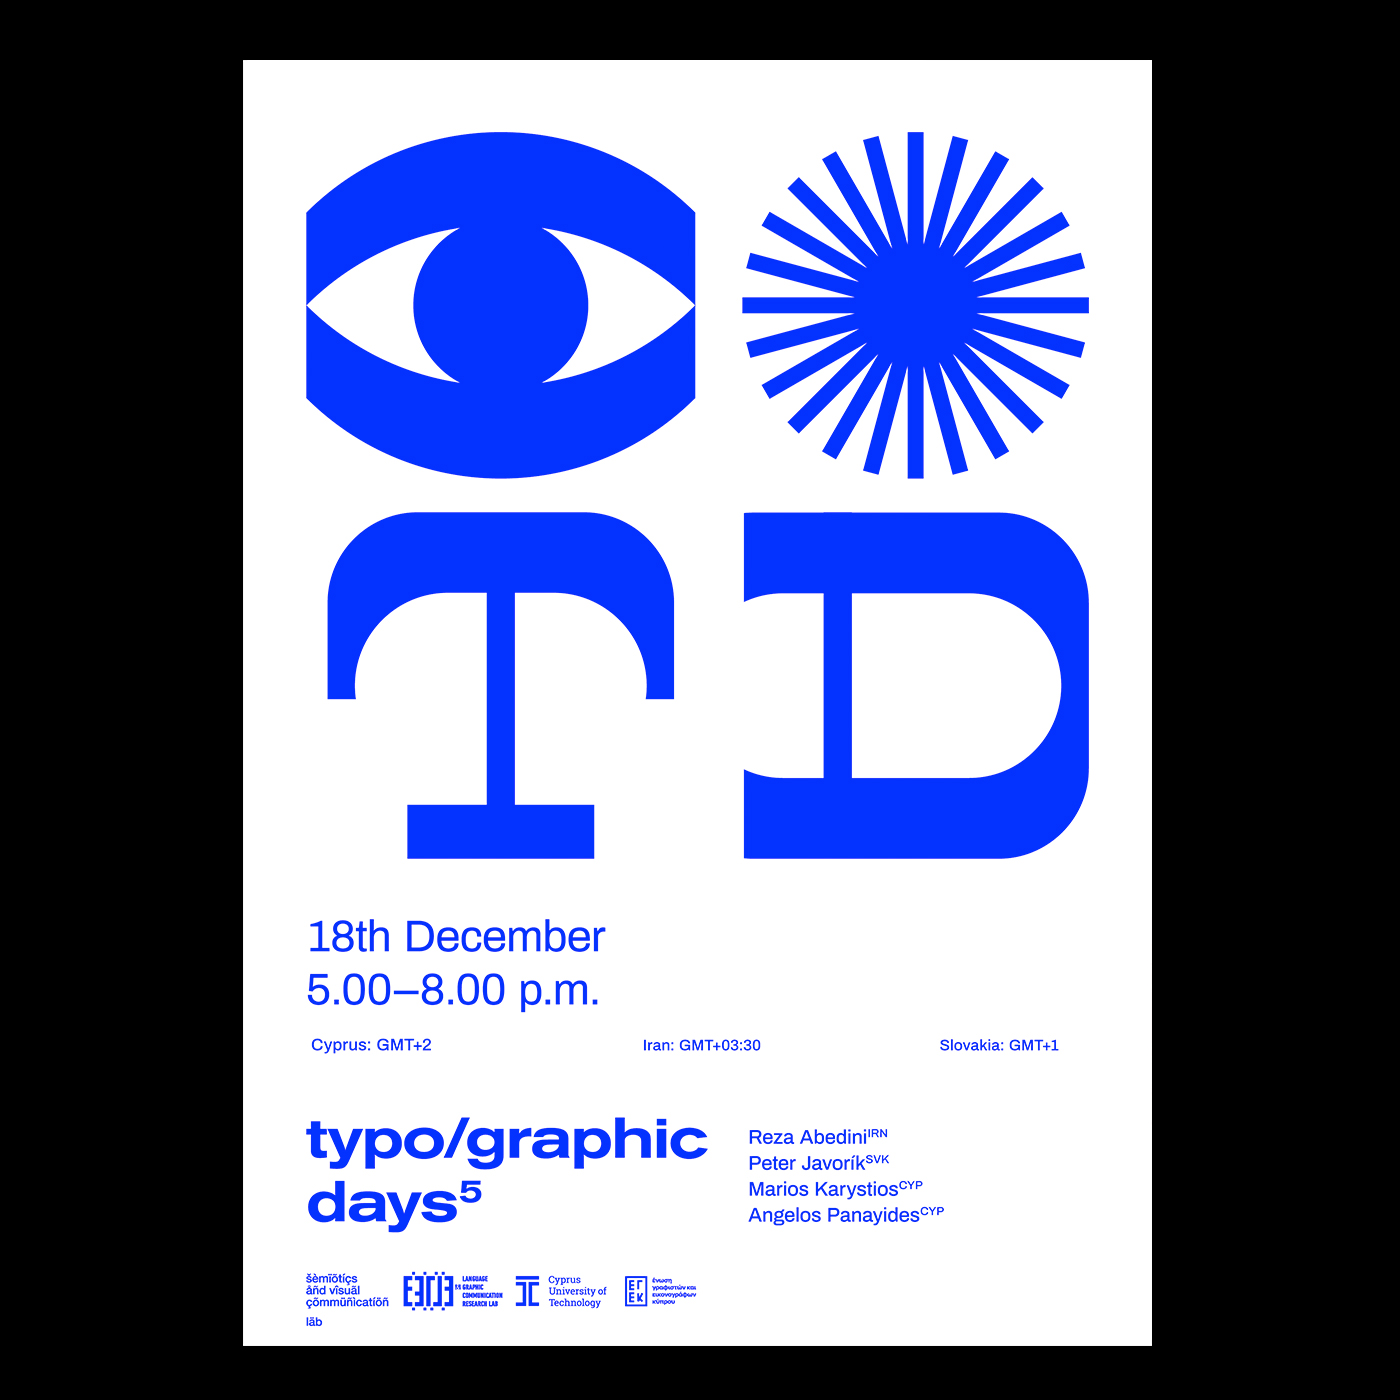 typographic days event poster